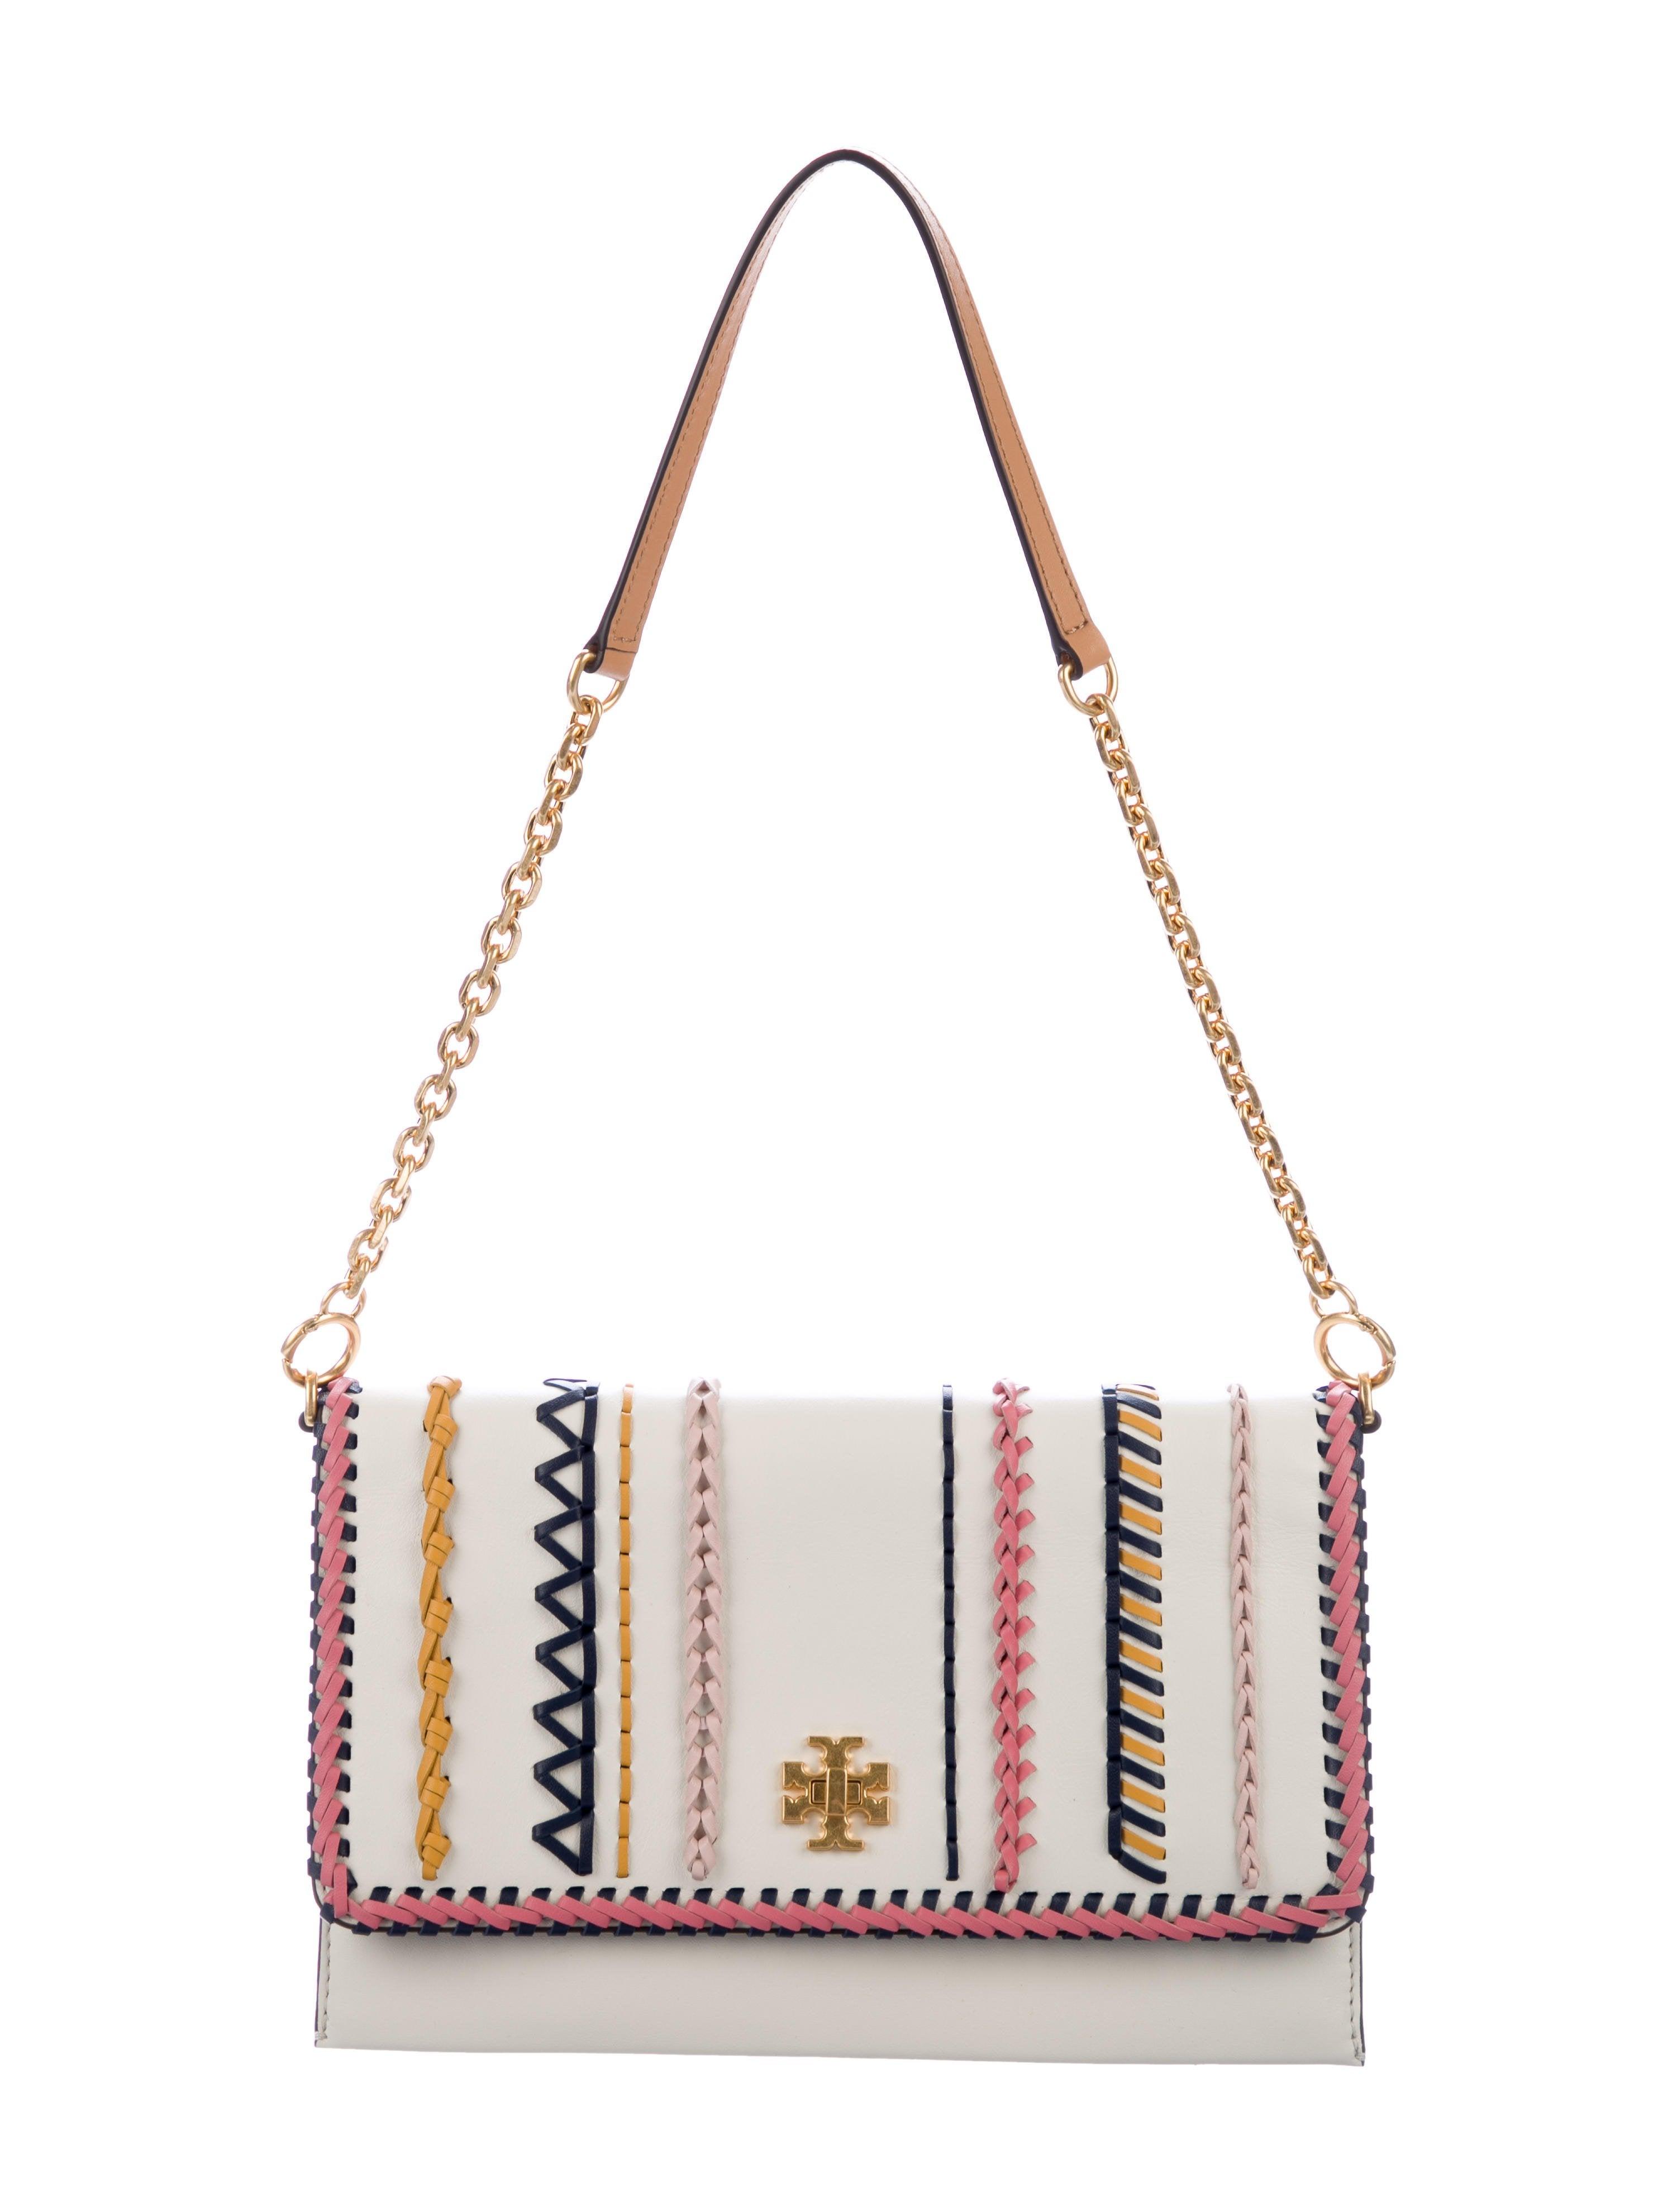 5e38239212f0 Tory Burch Kira Whipstitch Clutch w  Tags - Handbags - WTO154033 ...